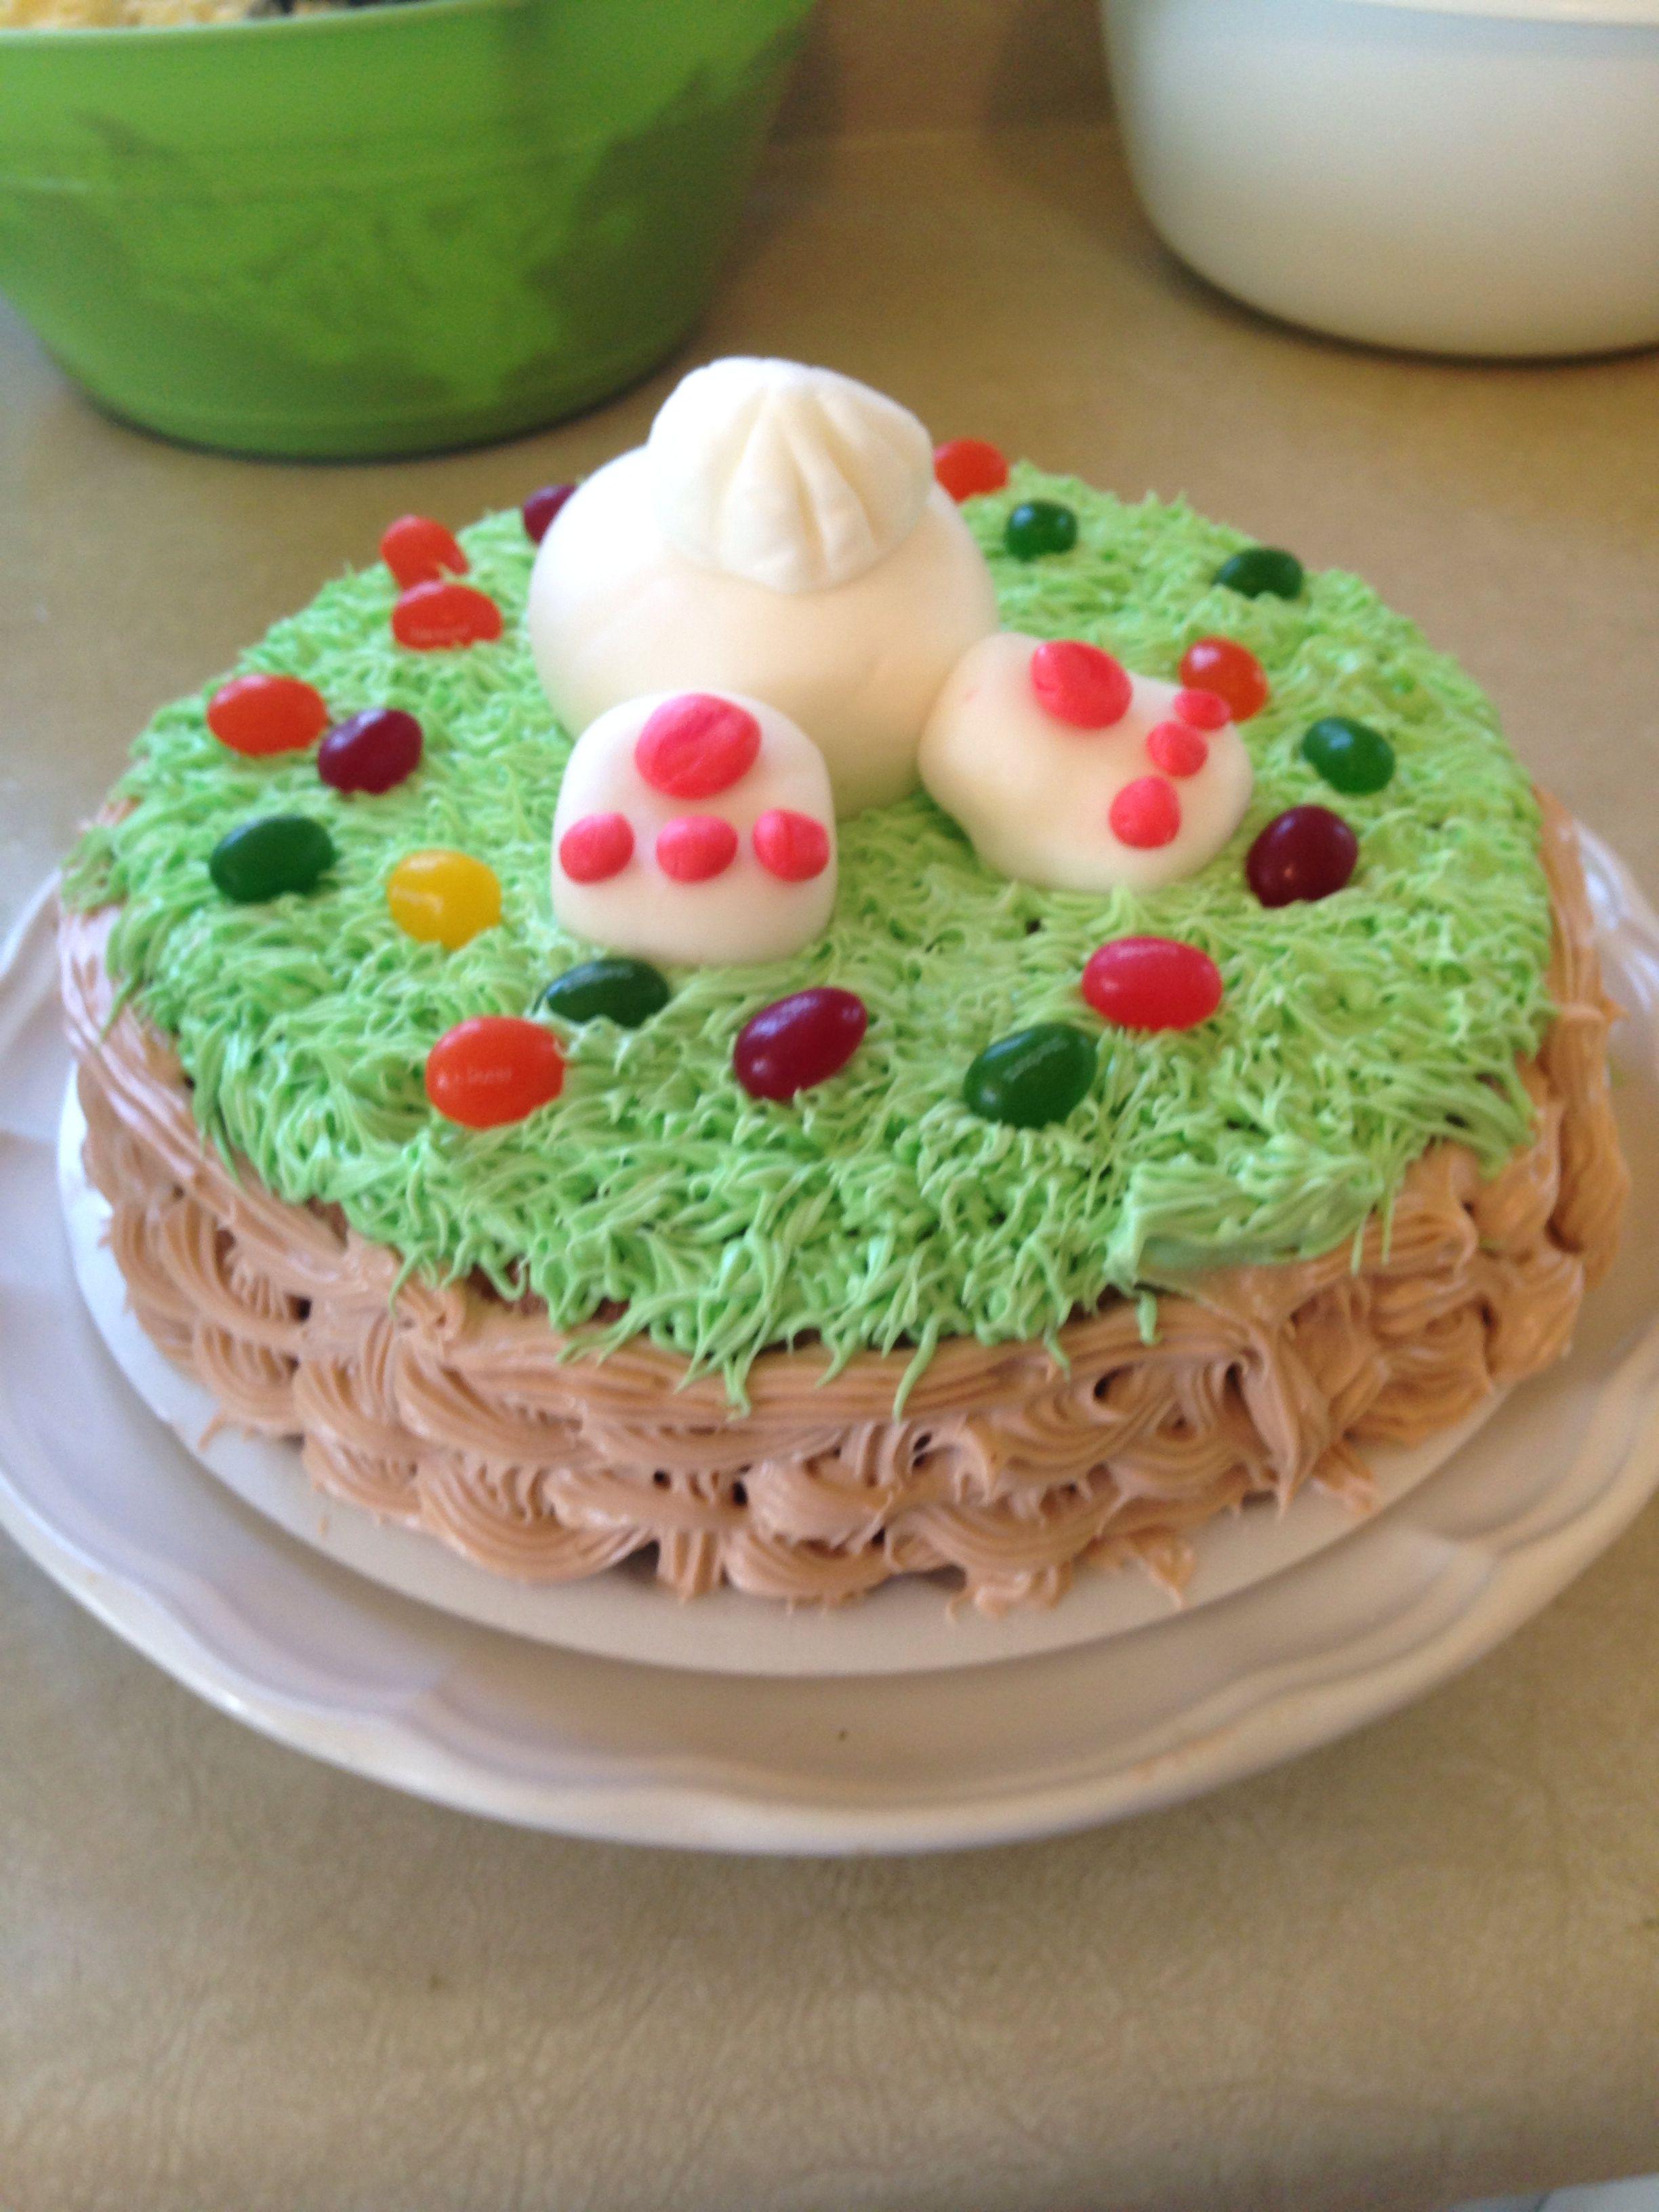 Easter Cake Design Photos : Easter bunny cake cake_designs Pinterest